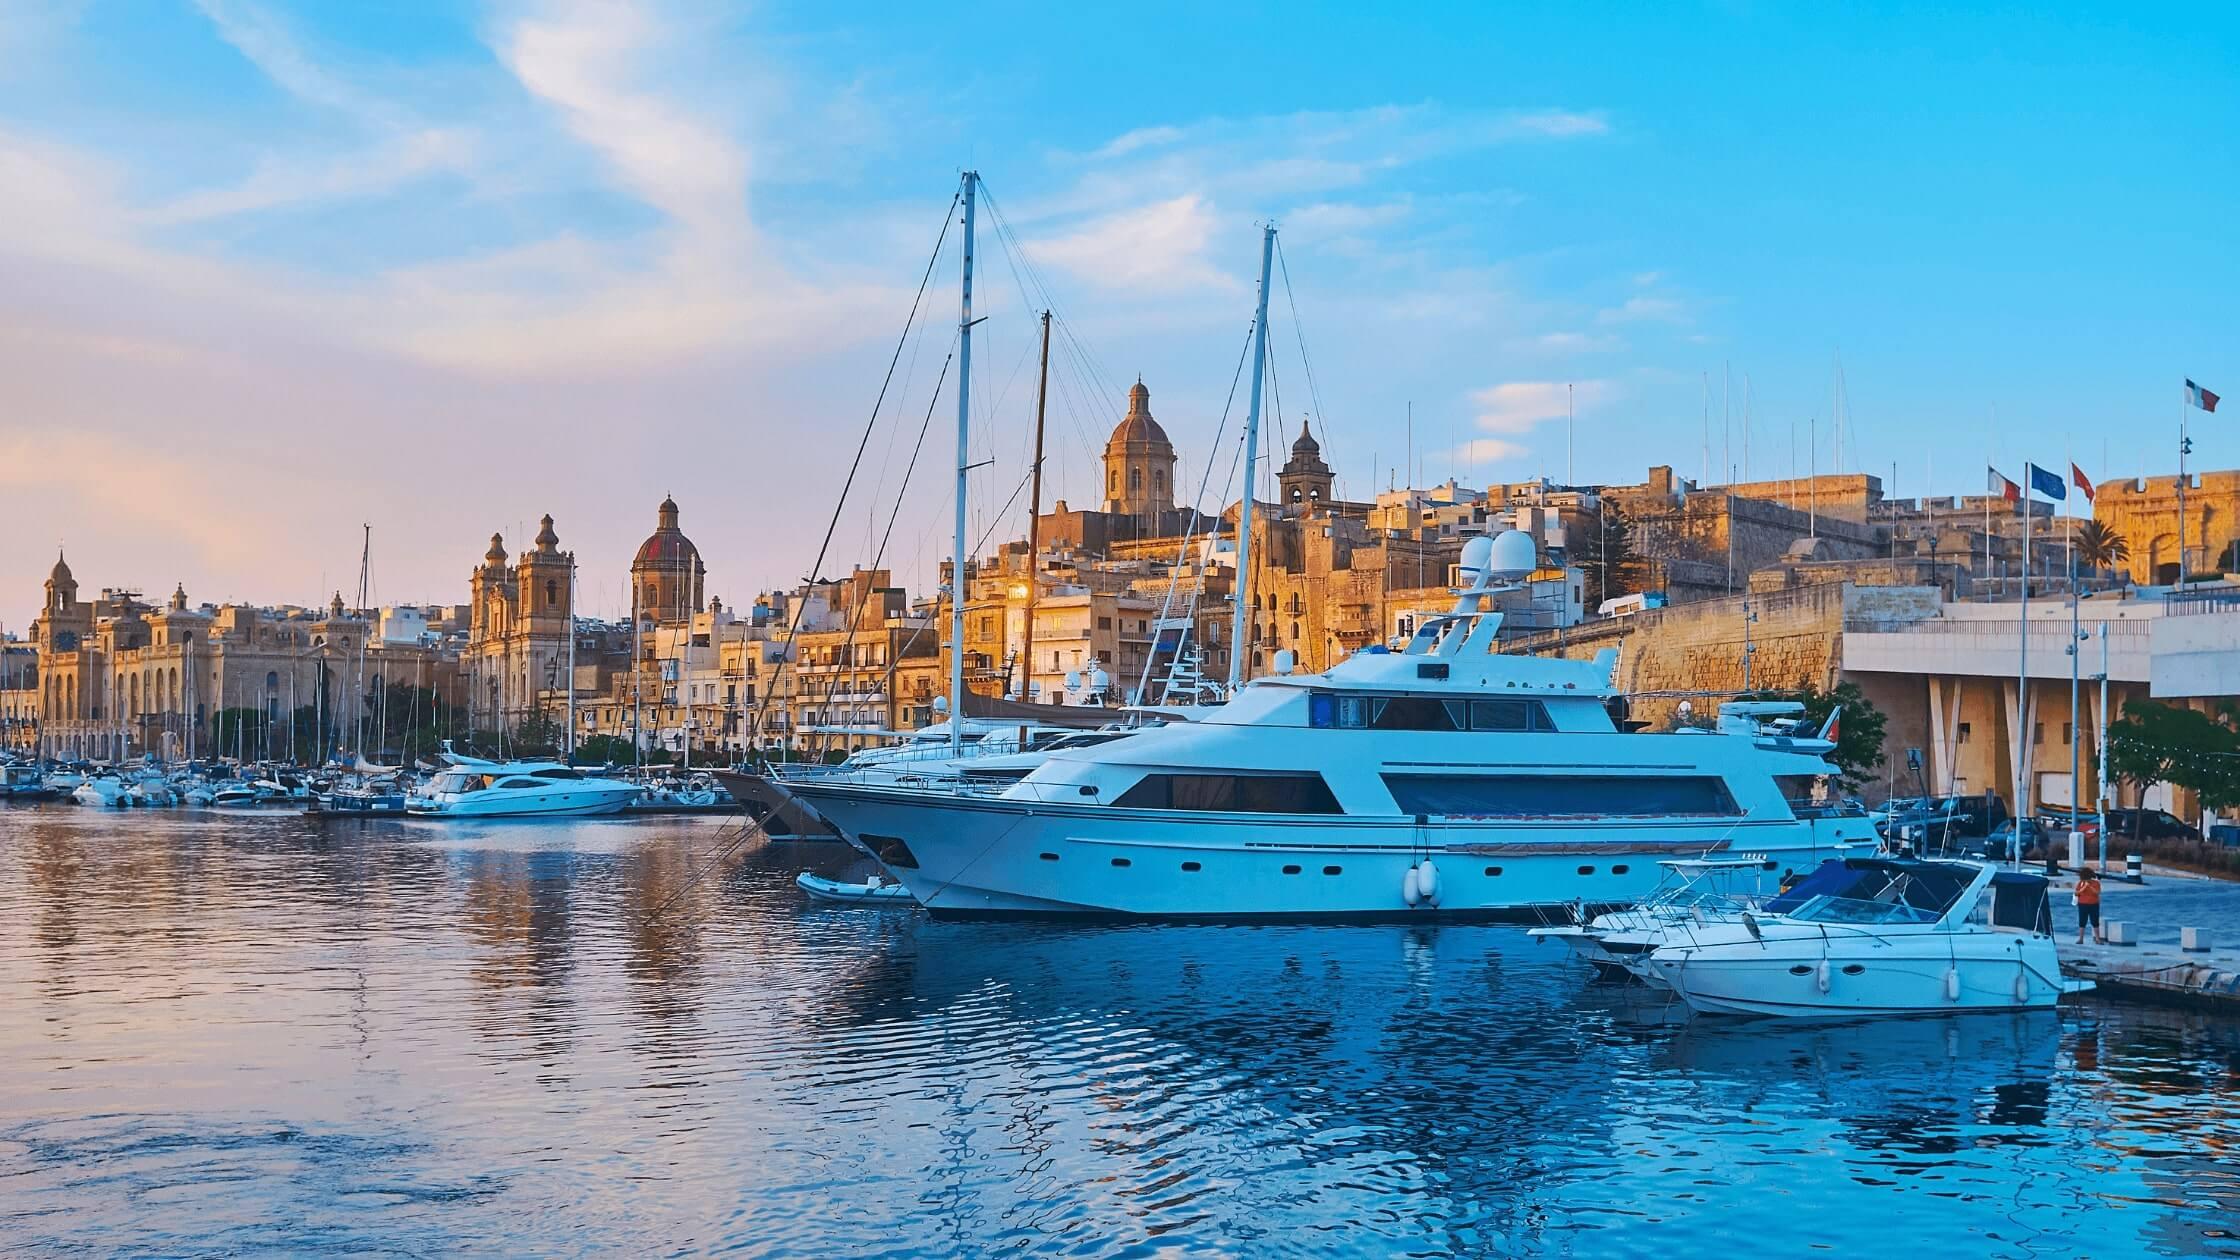 malta's ship registry named largest superyacht registry in the world